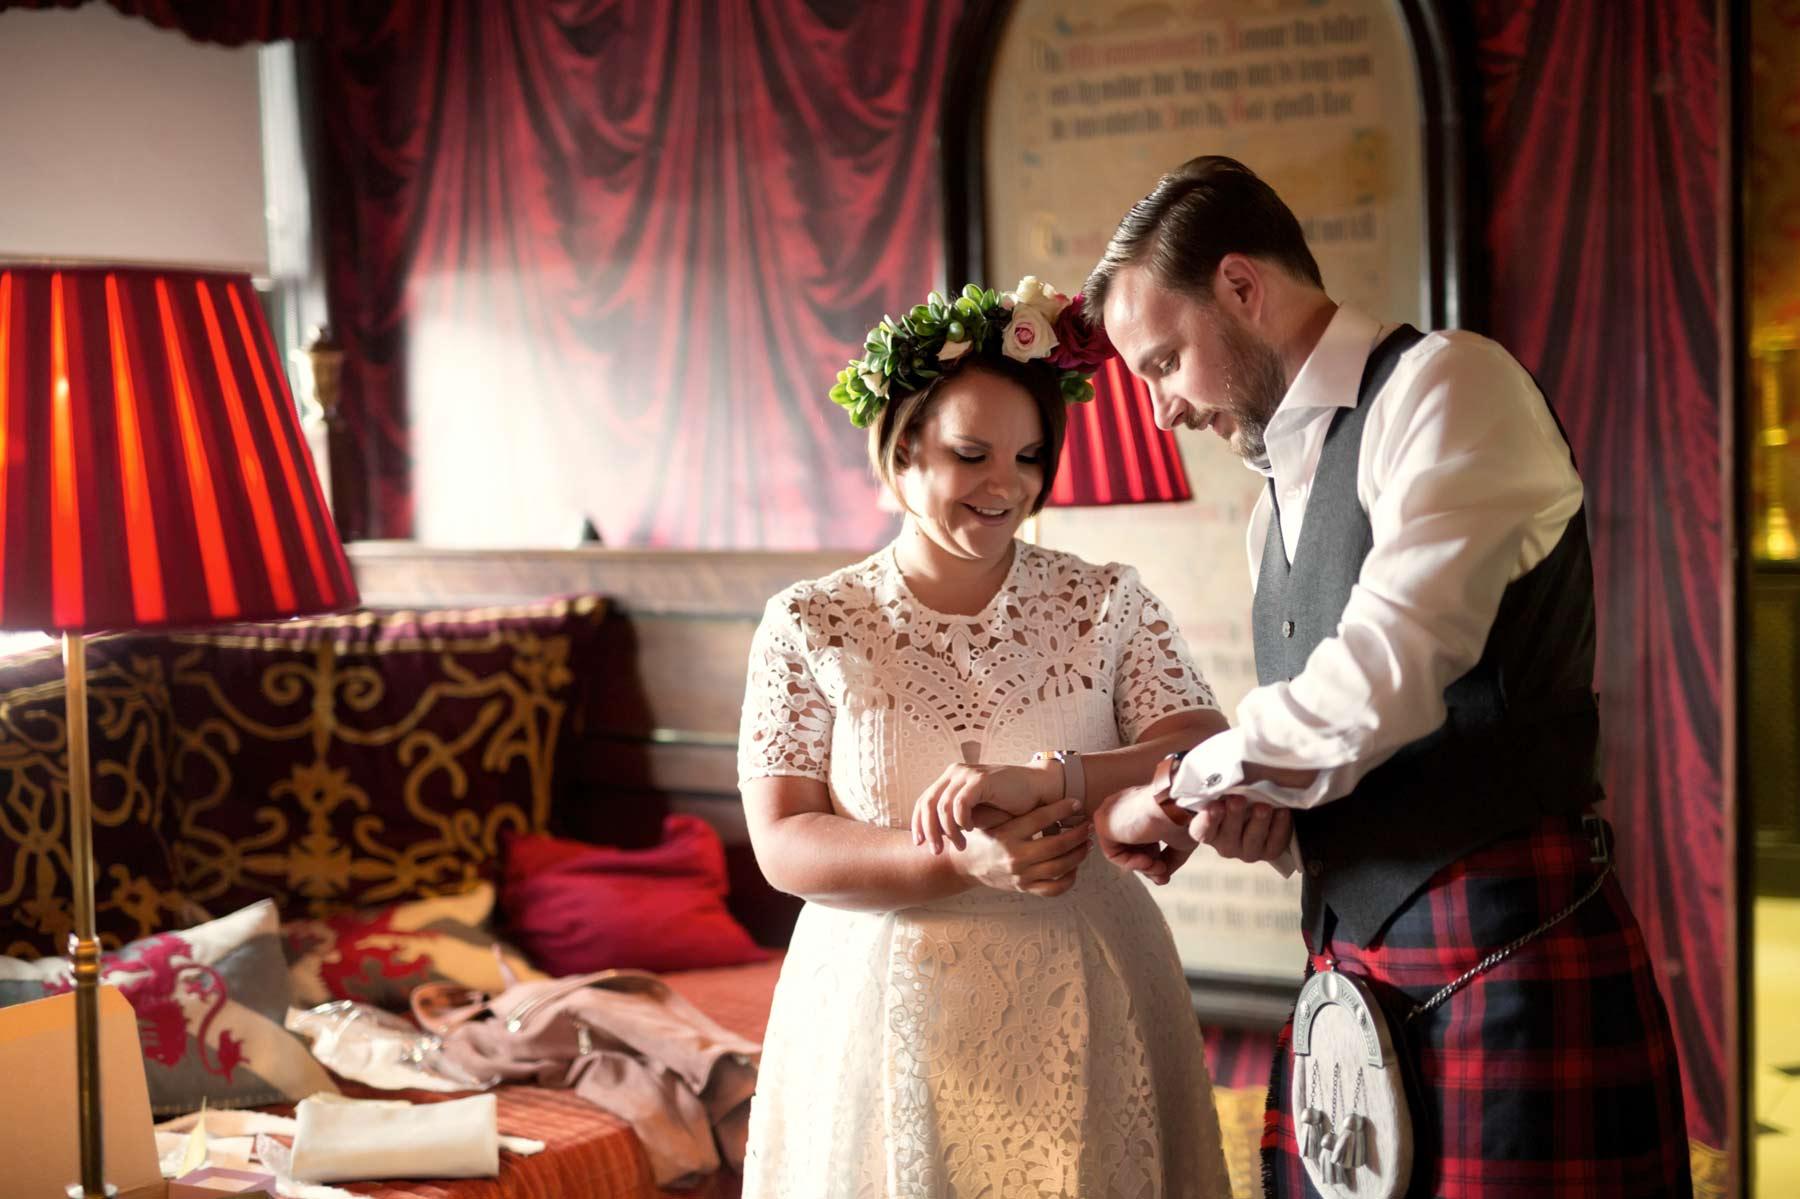 Bride, groom, gifts, The Witchery, wedding, Edinburgh